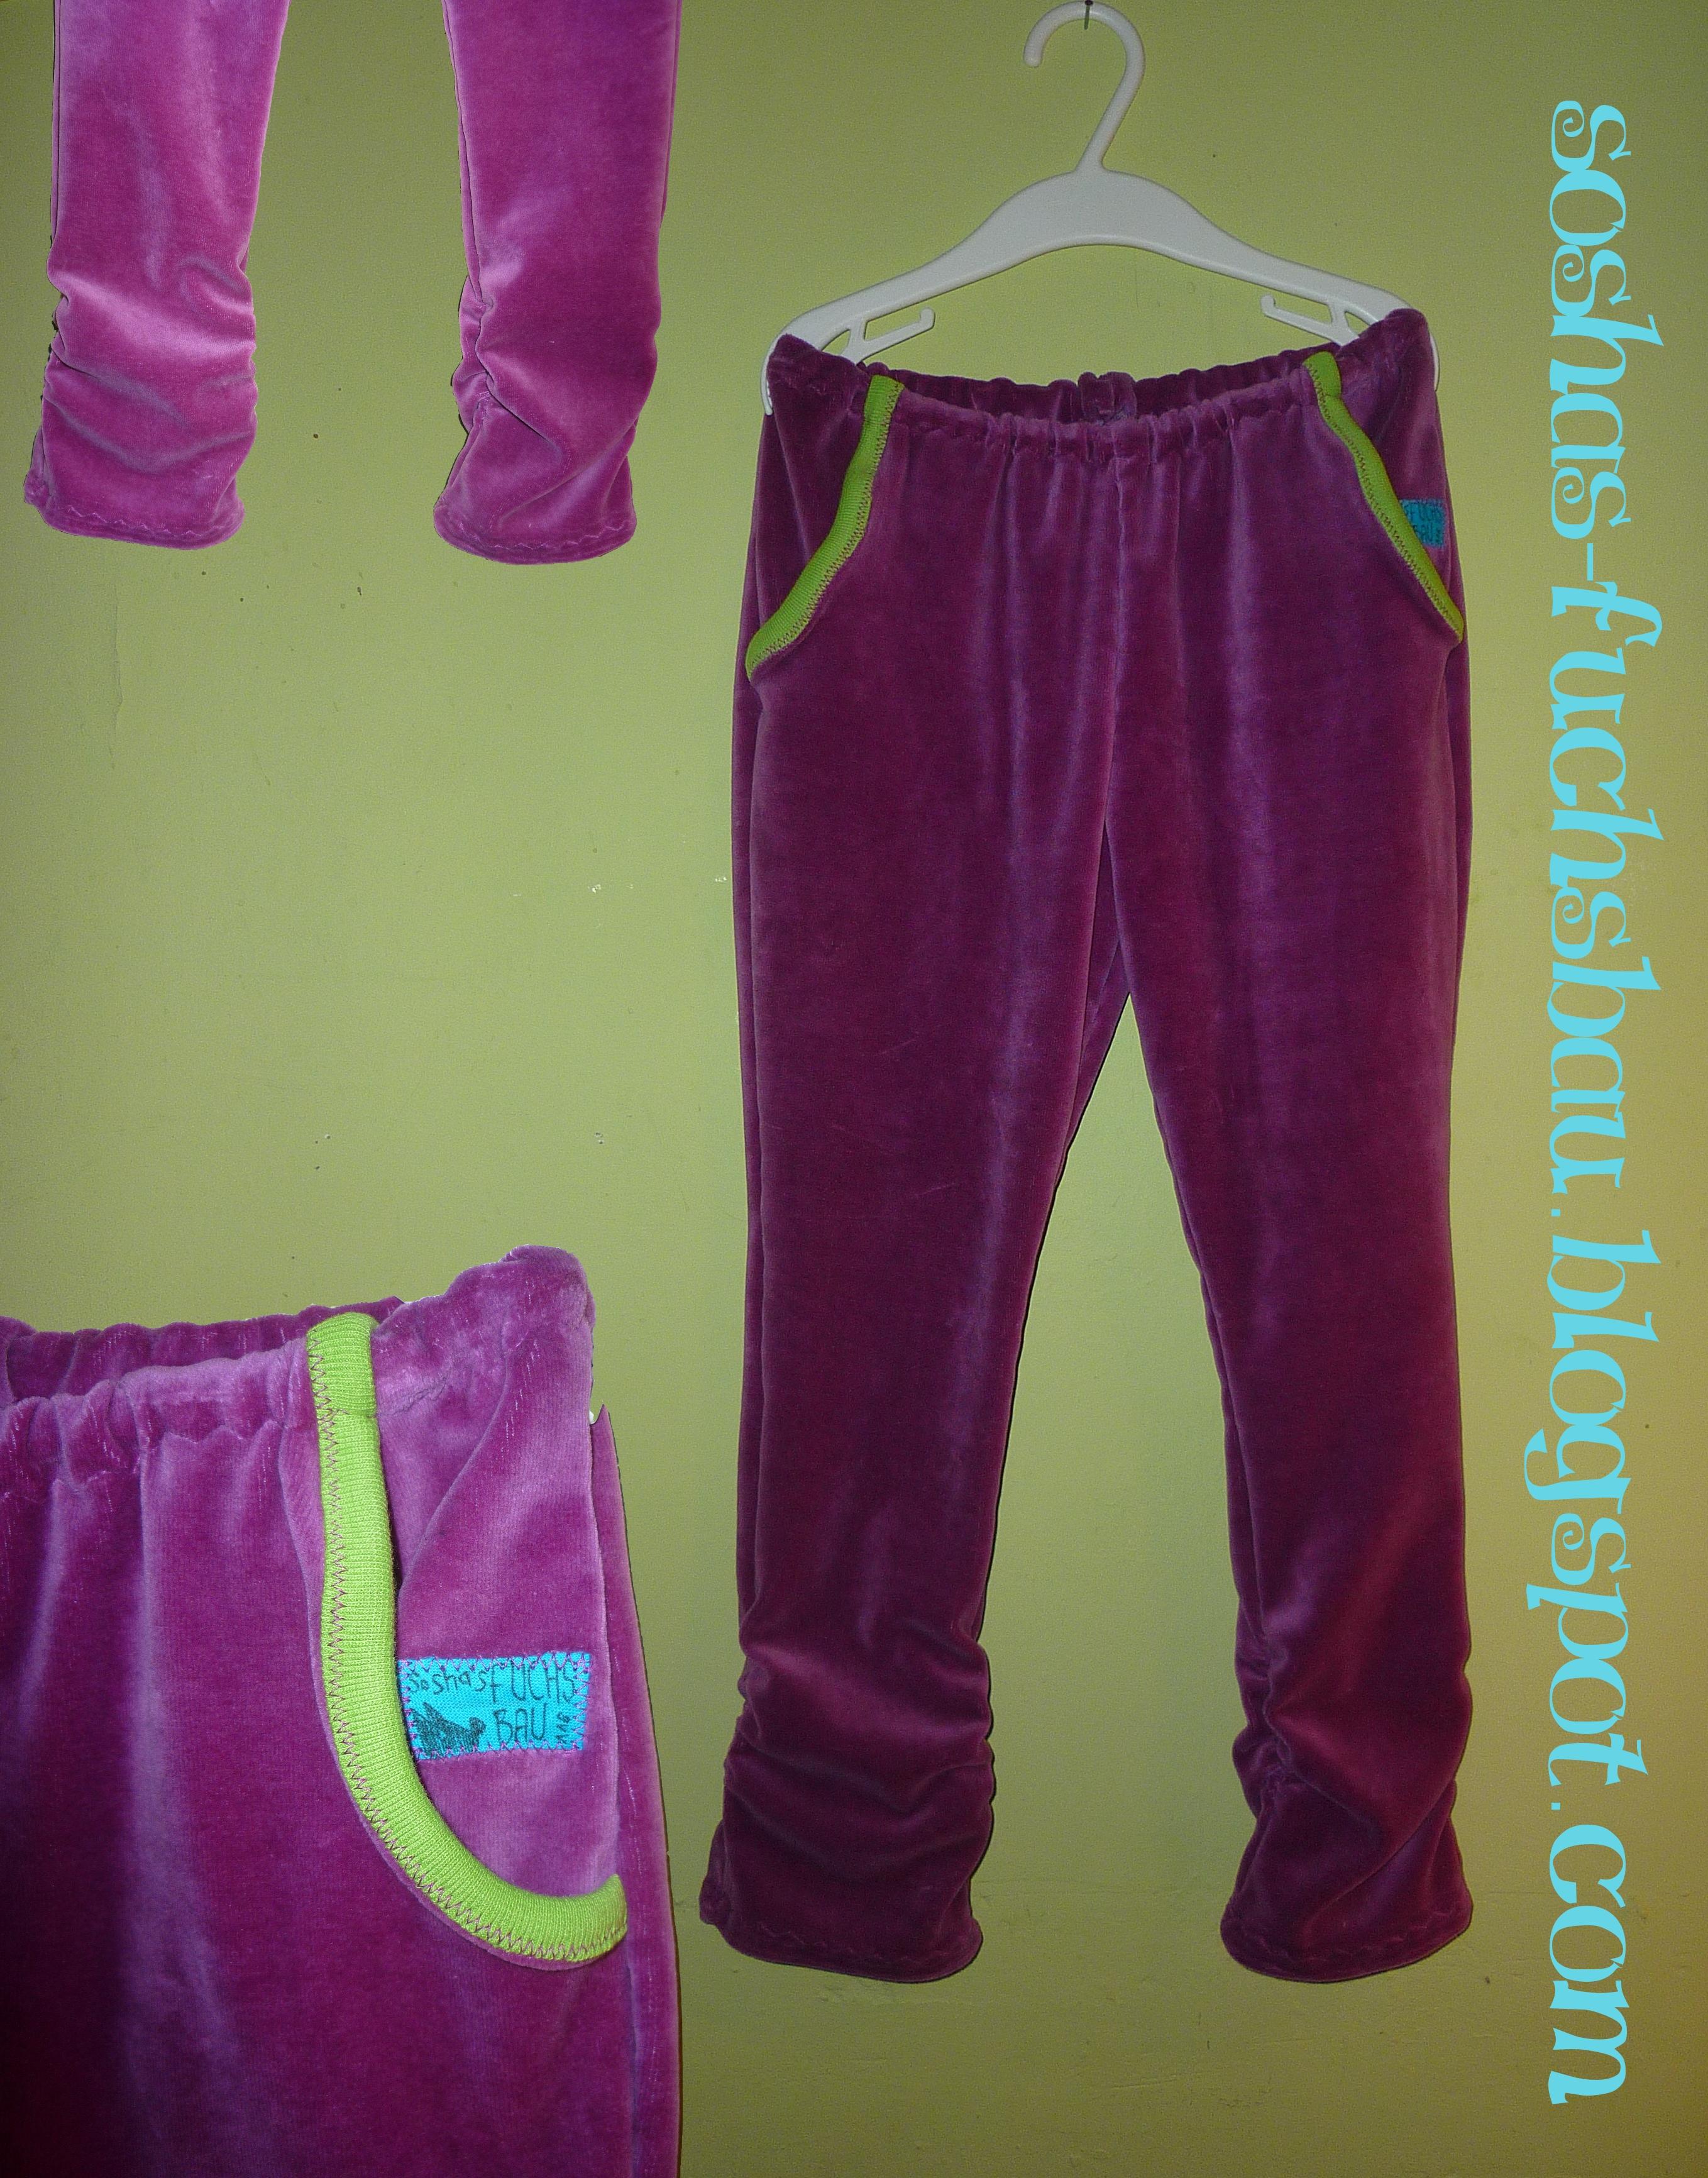 blackberry pants by sosha89